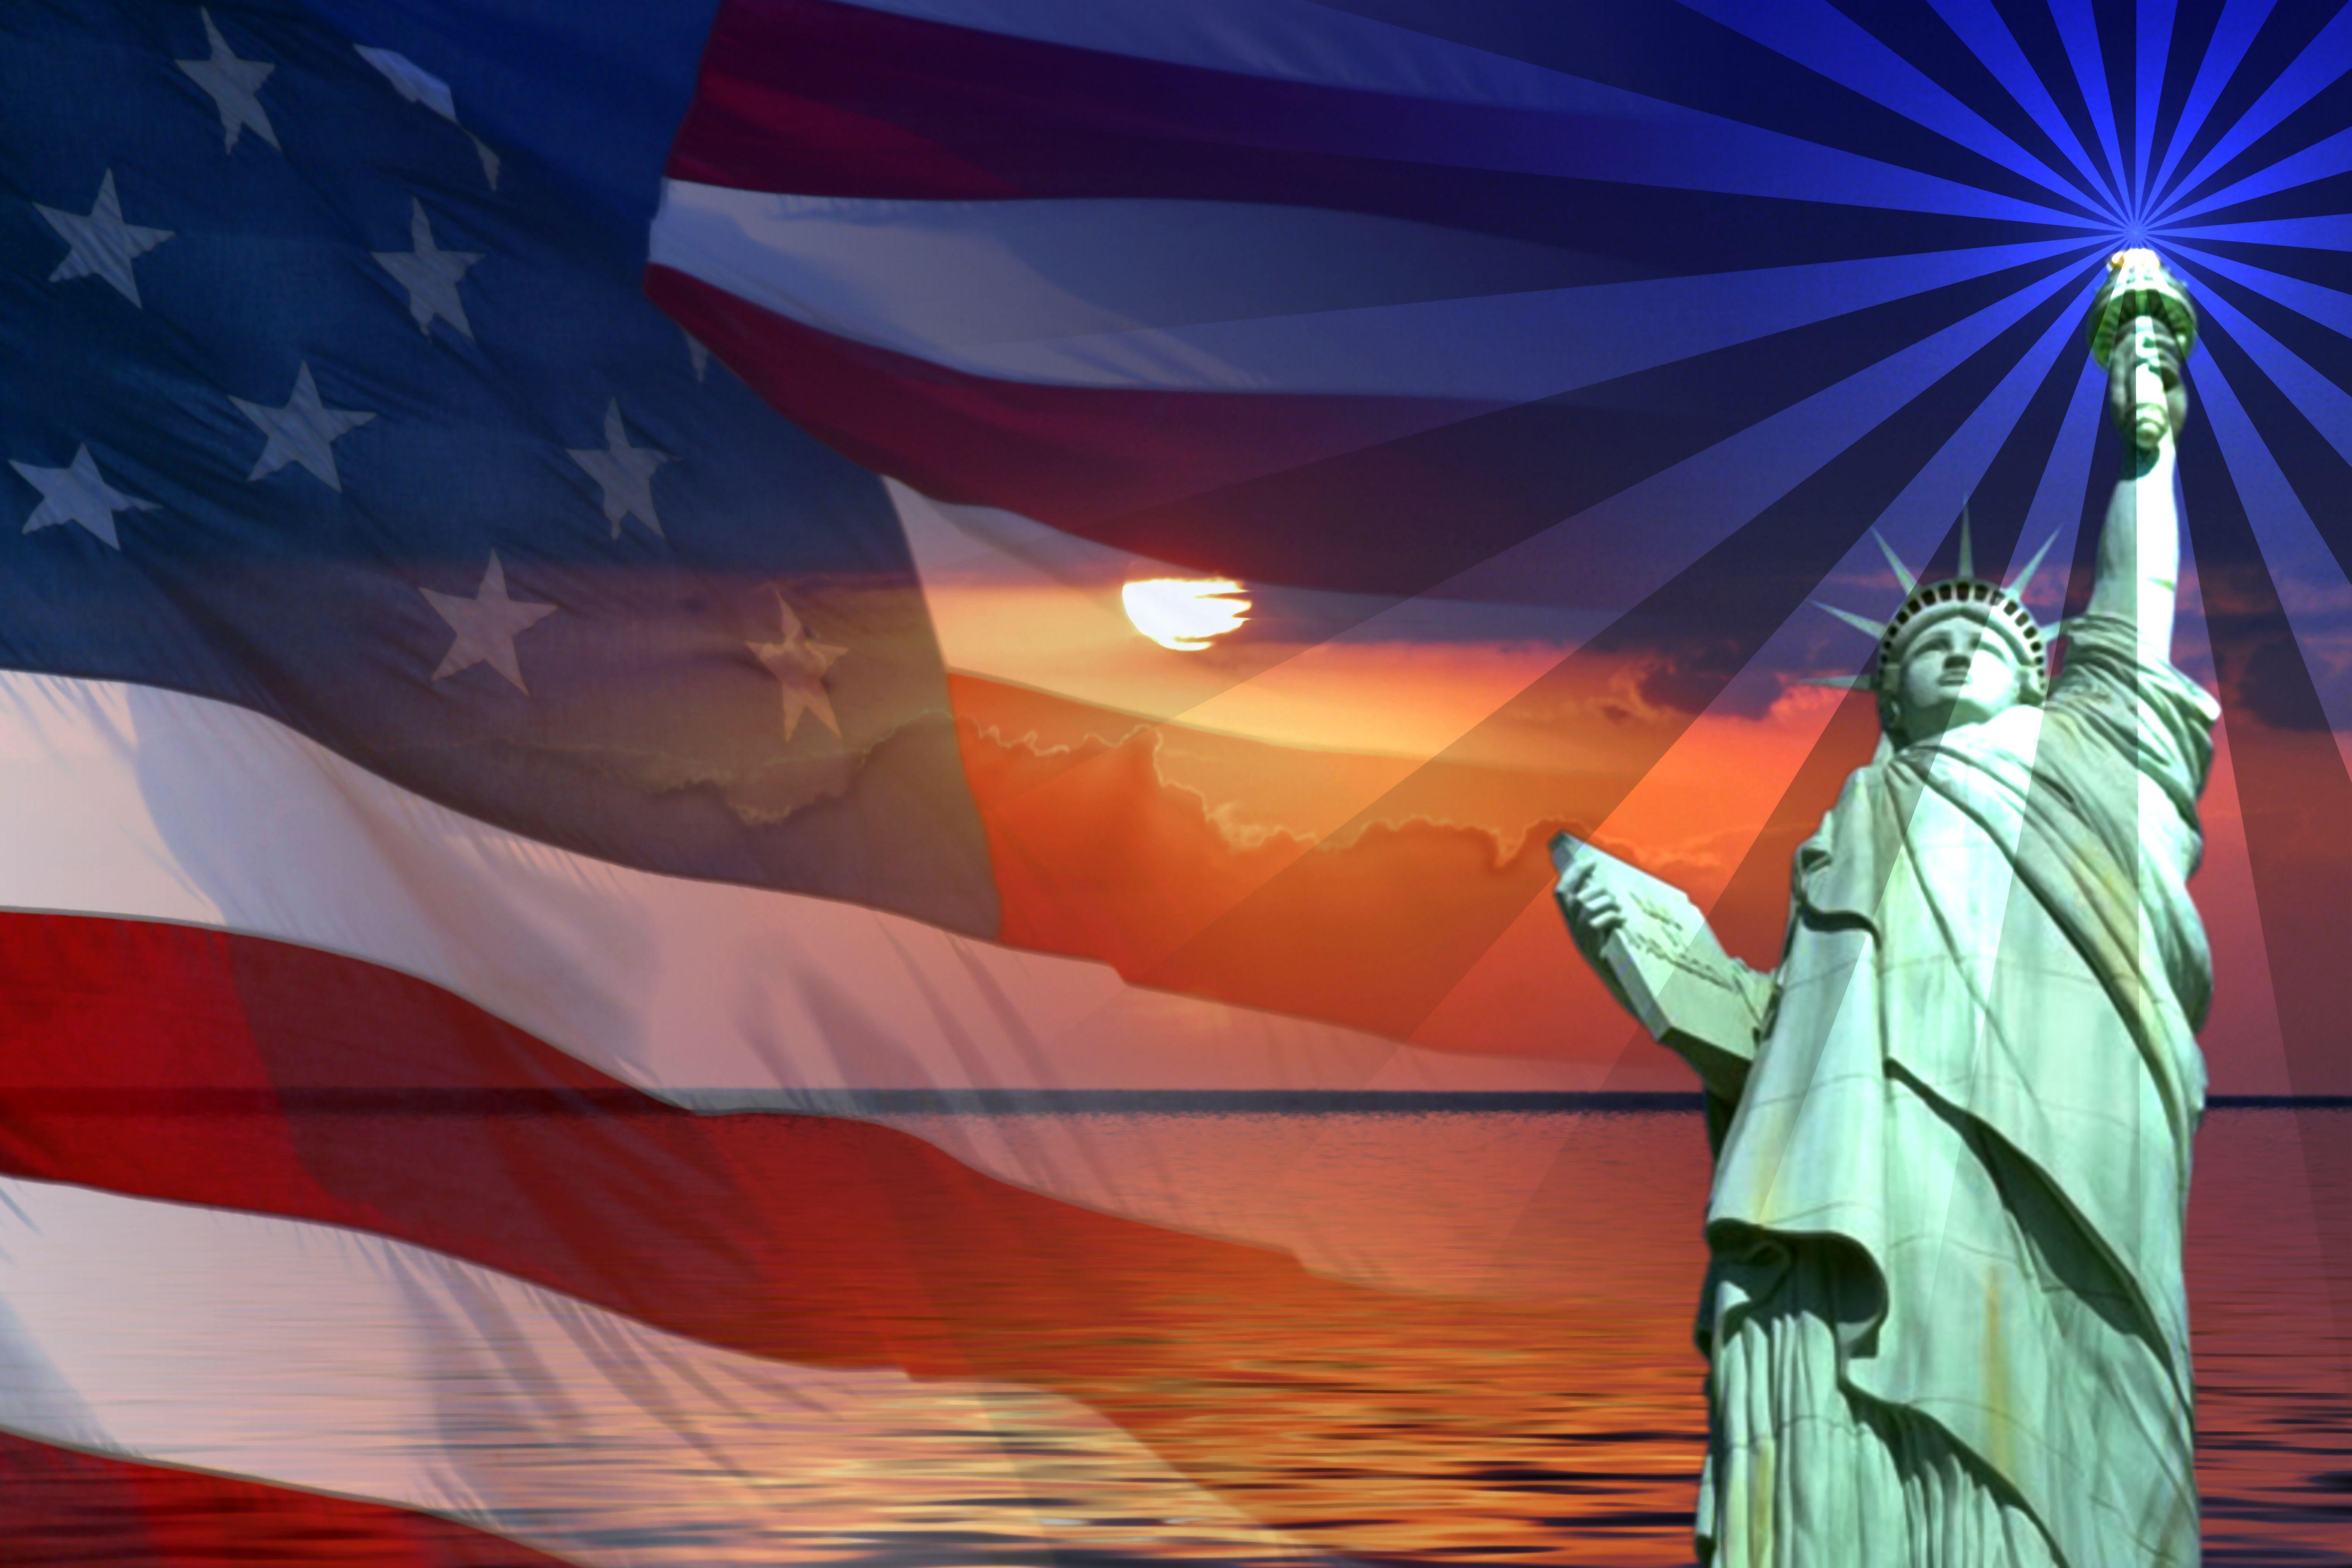 Patriotic Backgrounds 5400x3600